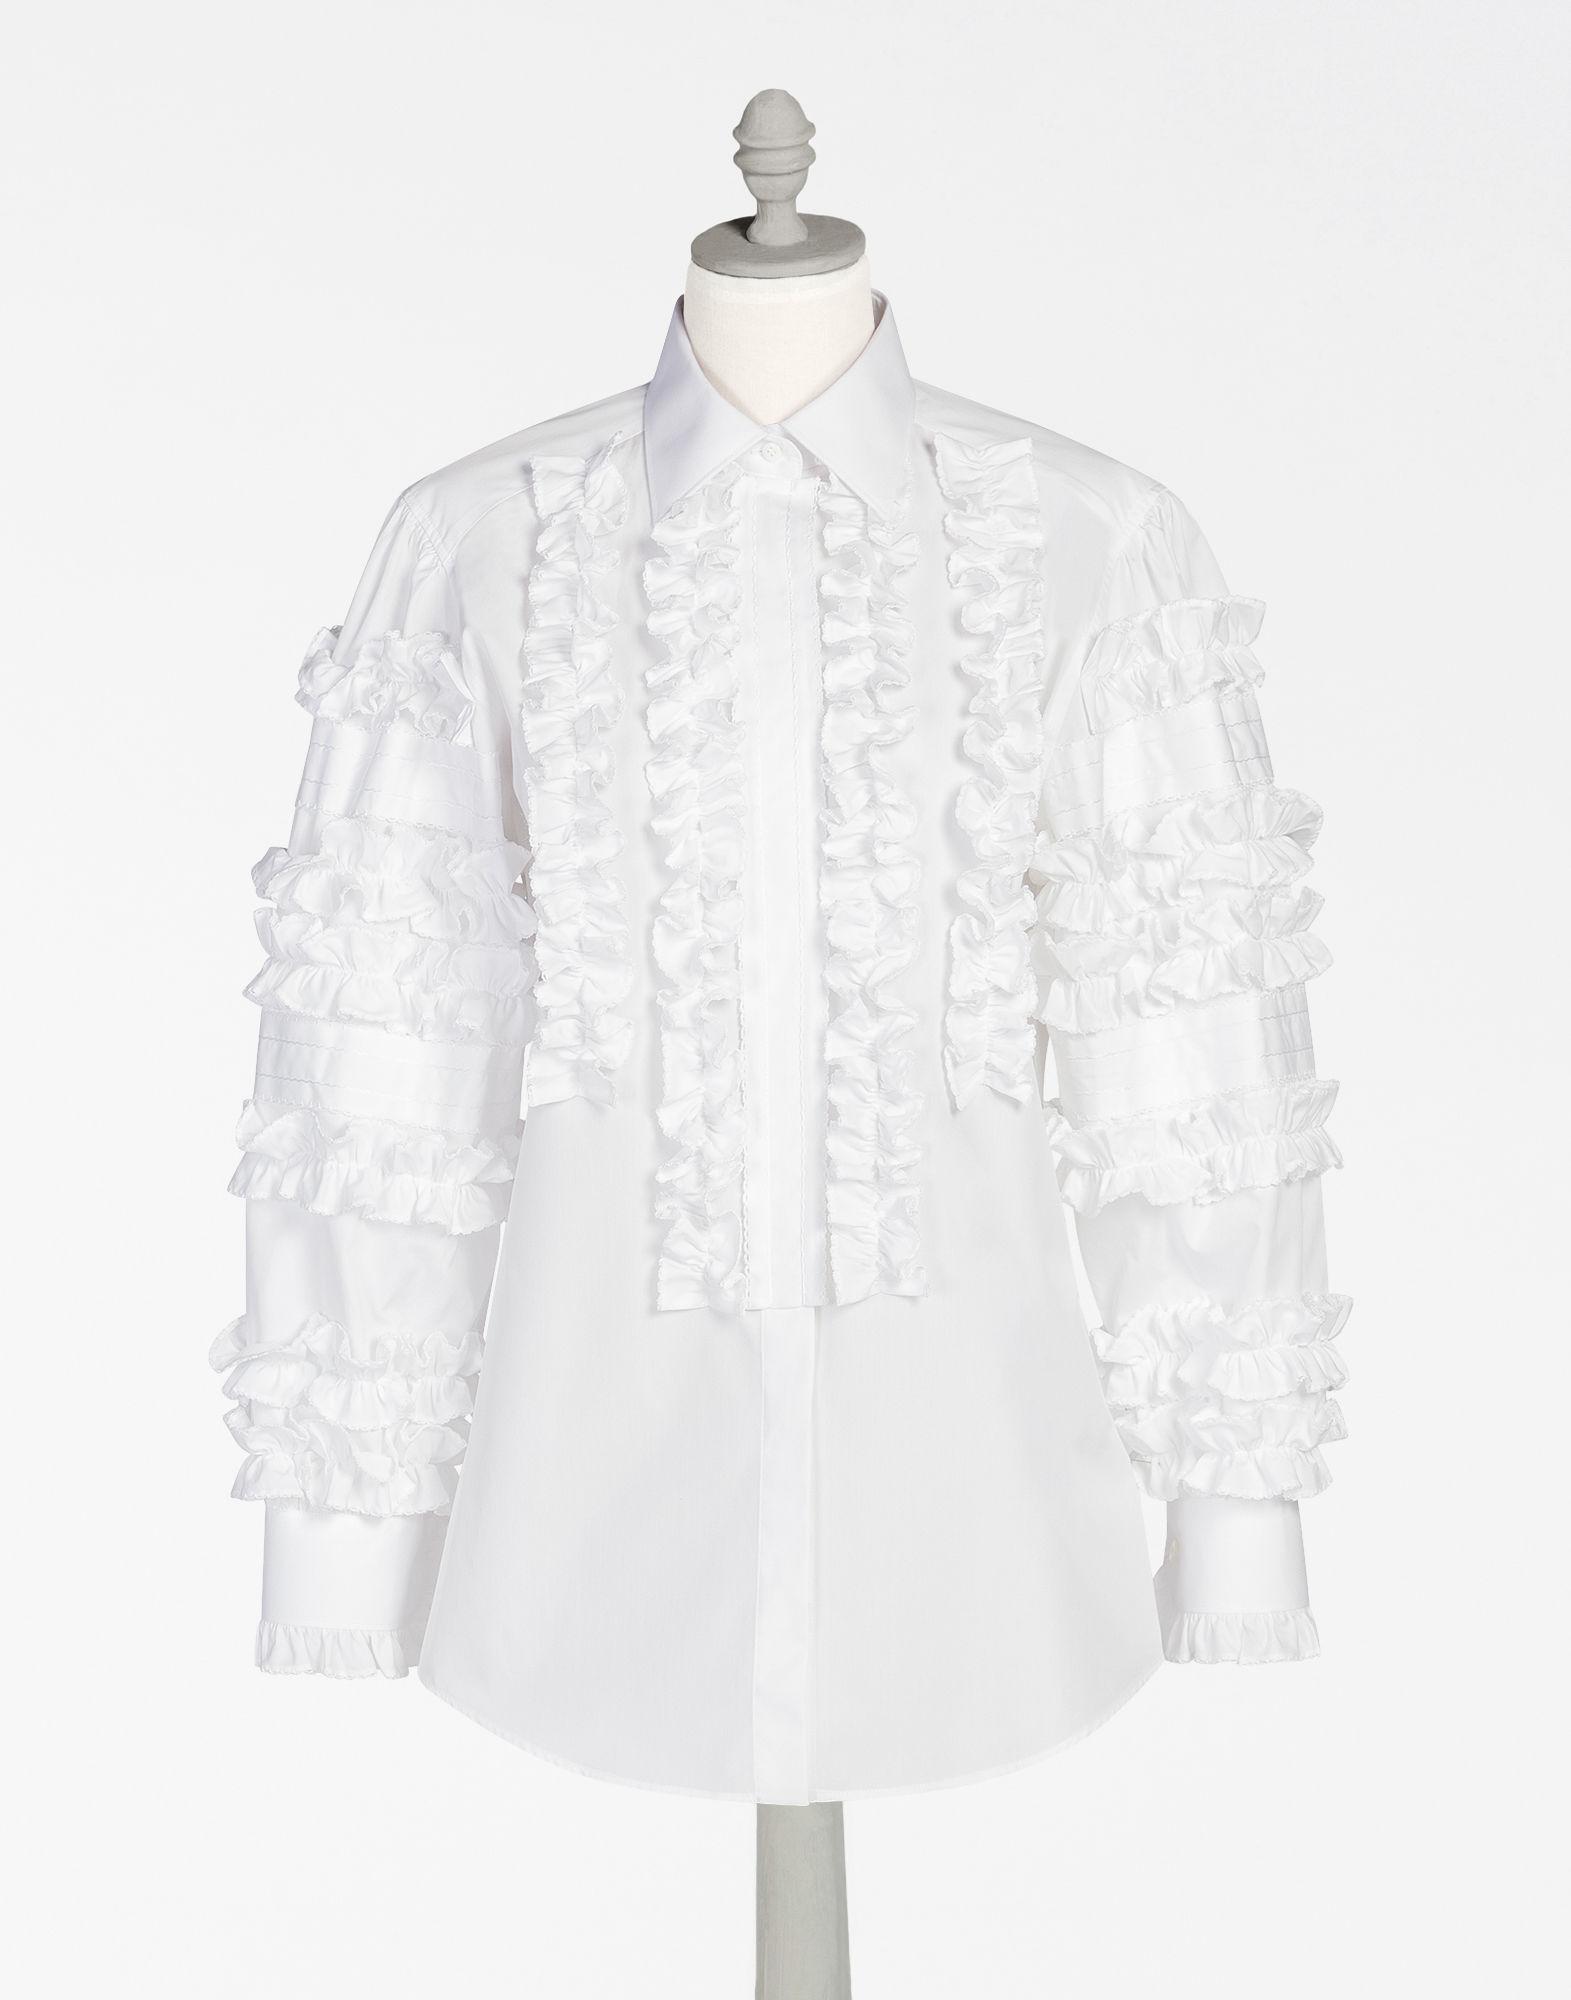 DOLCE & GABBANA Cotton Shirt With Ruche Details in White